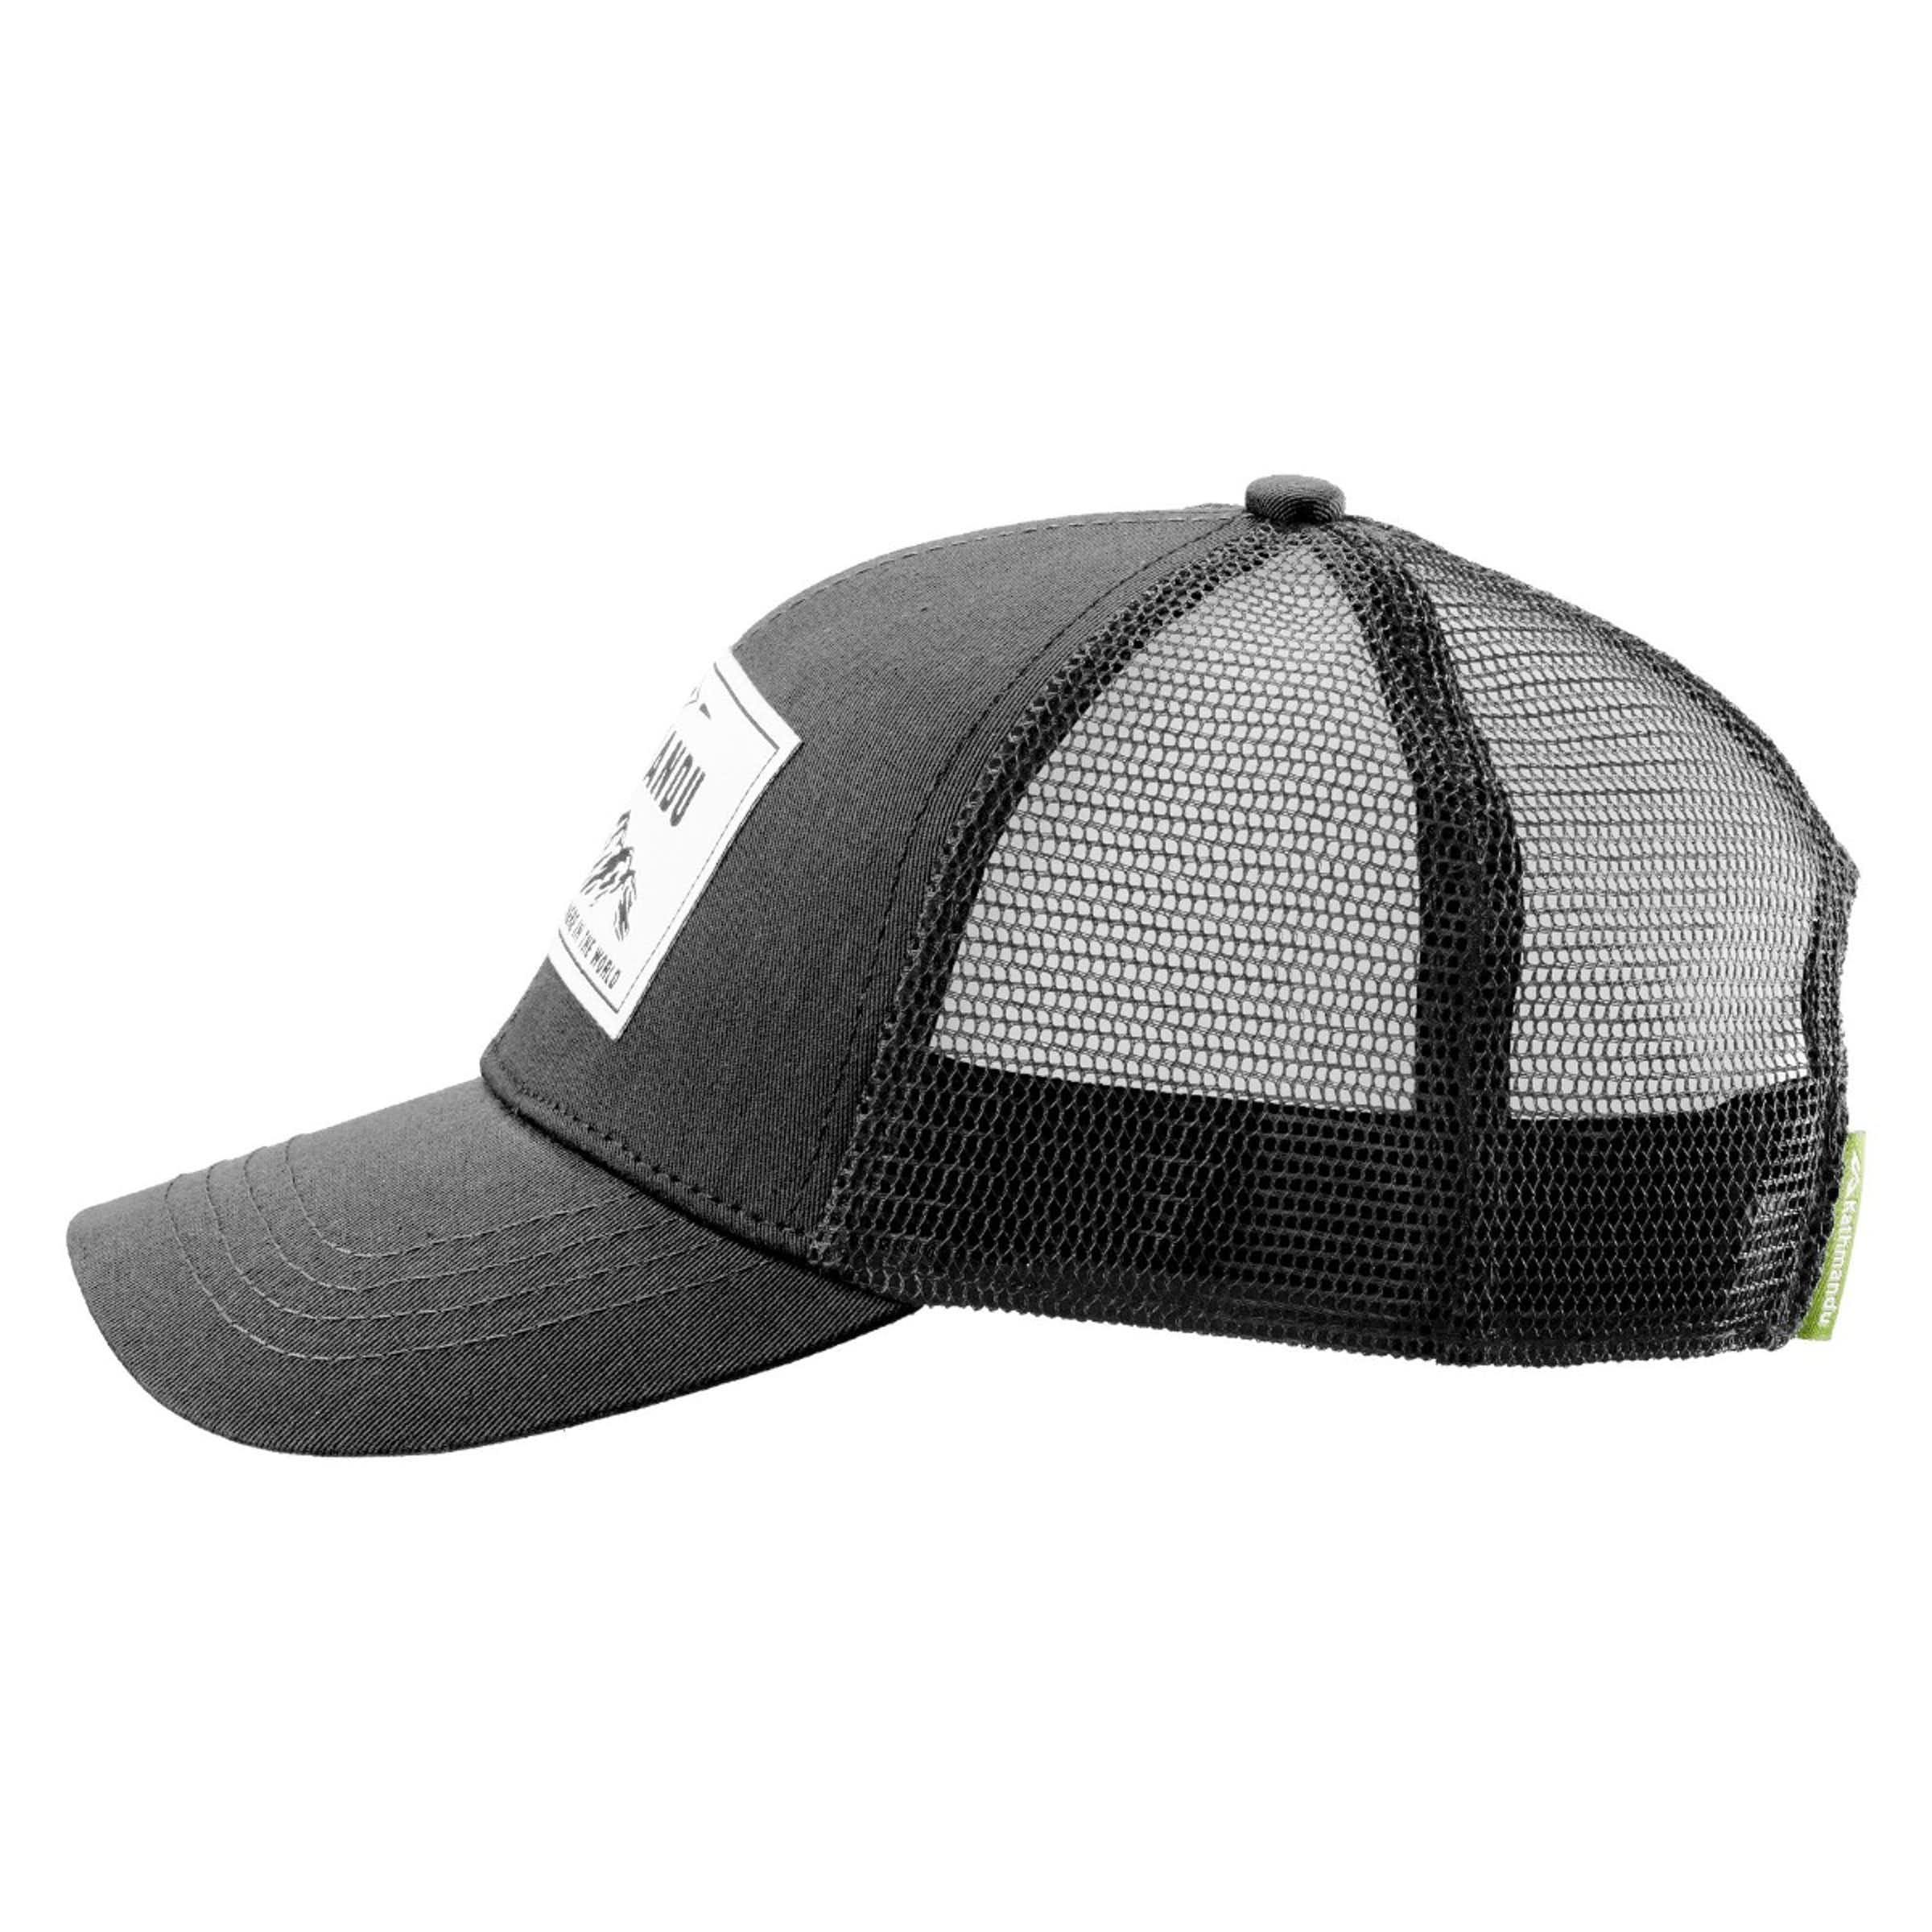 Womens Hats, Caps & Scarves   Beanie Hats for Ladies   AU